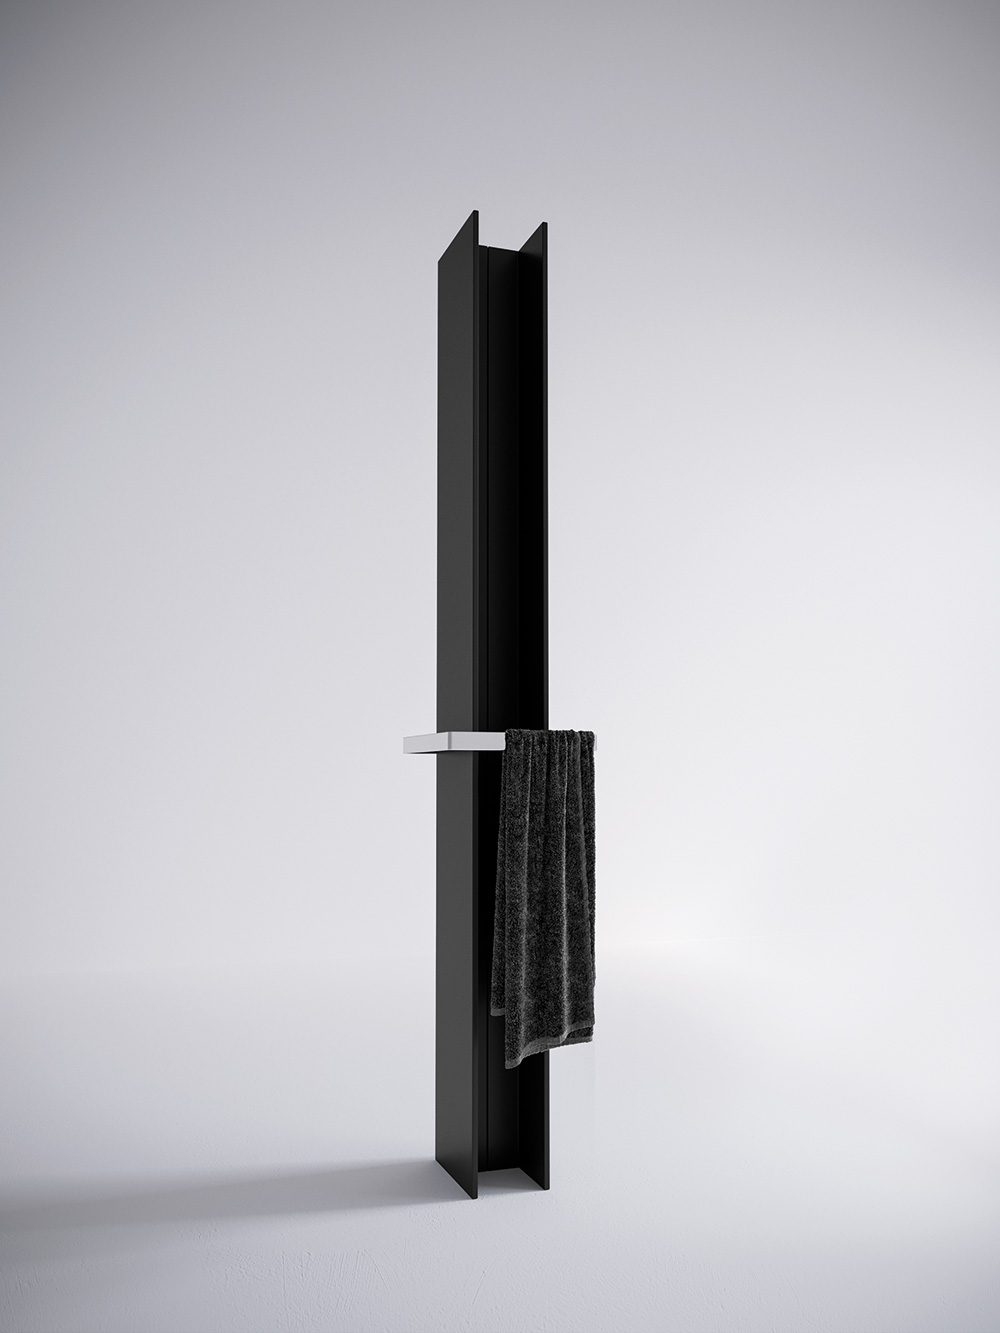 Antrax T Tower radiator